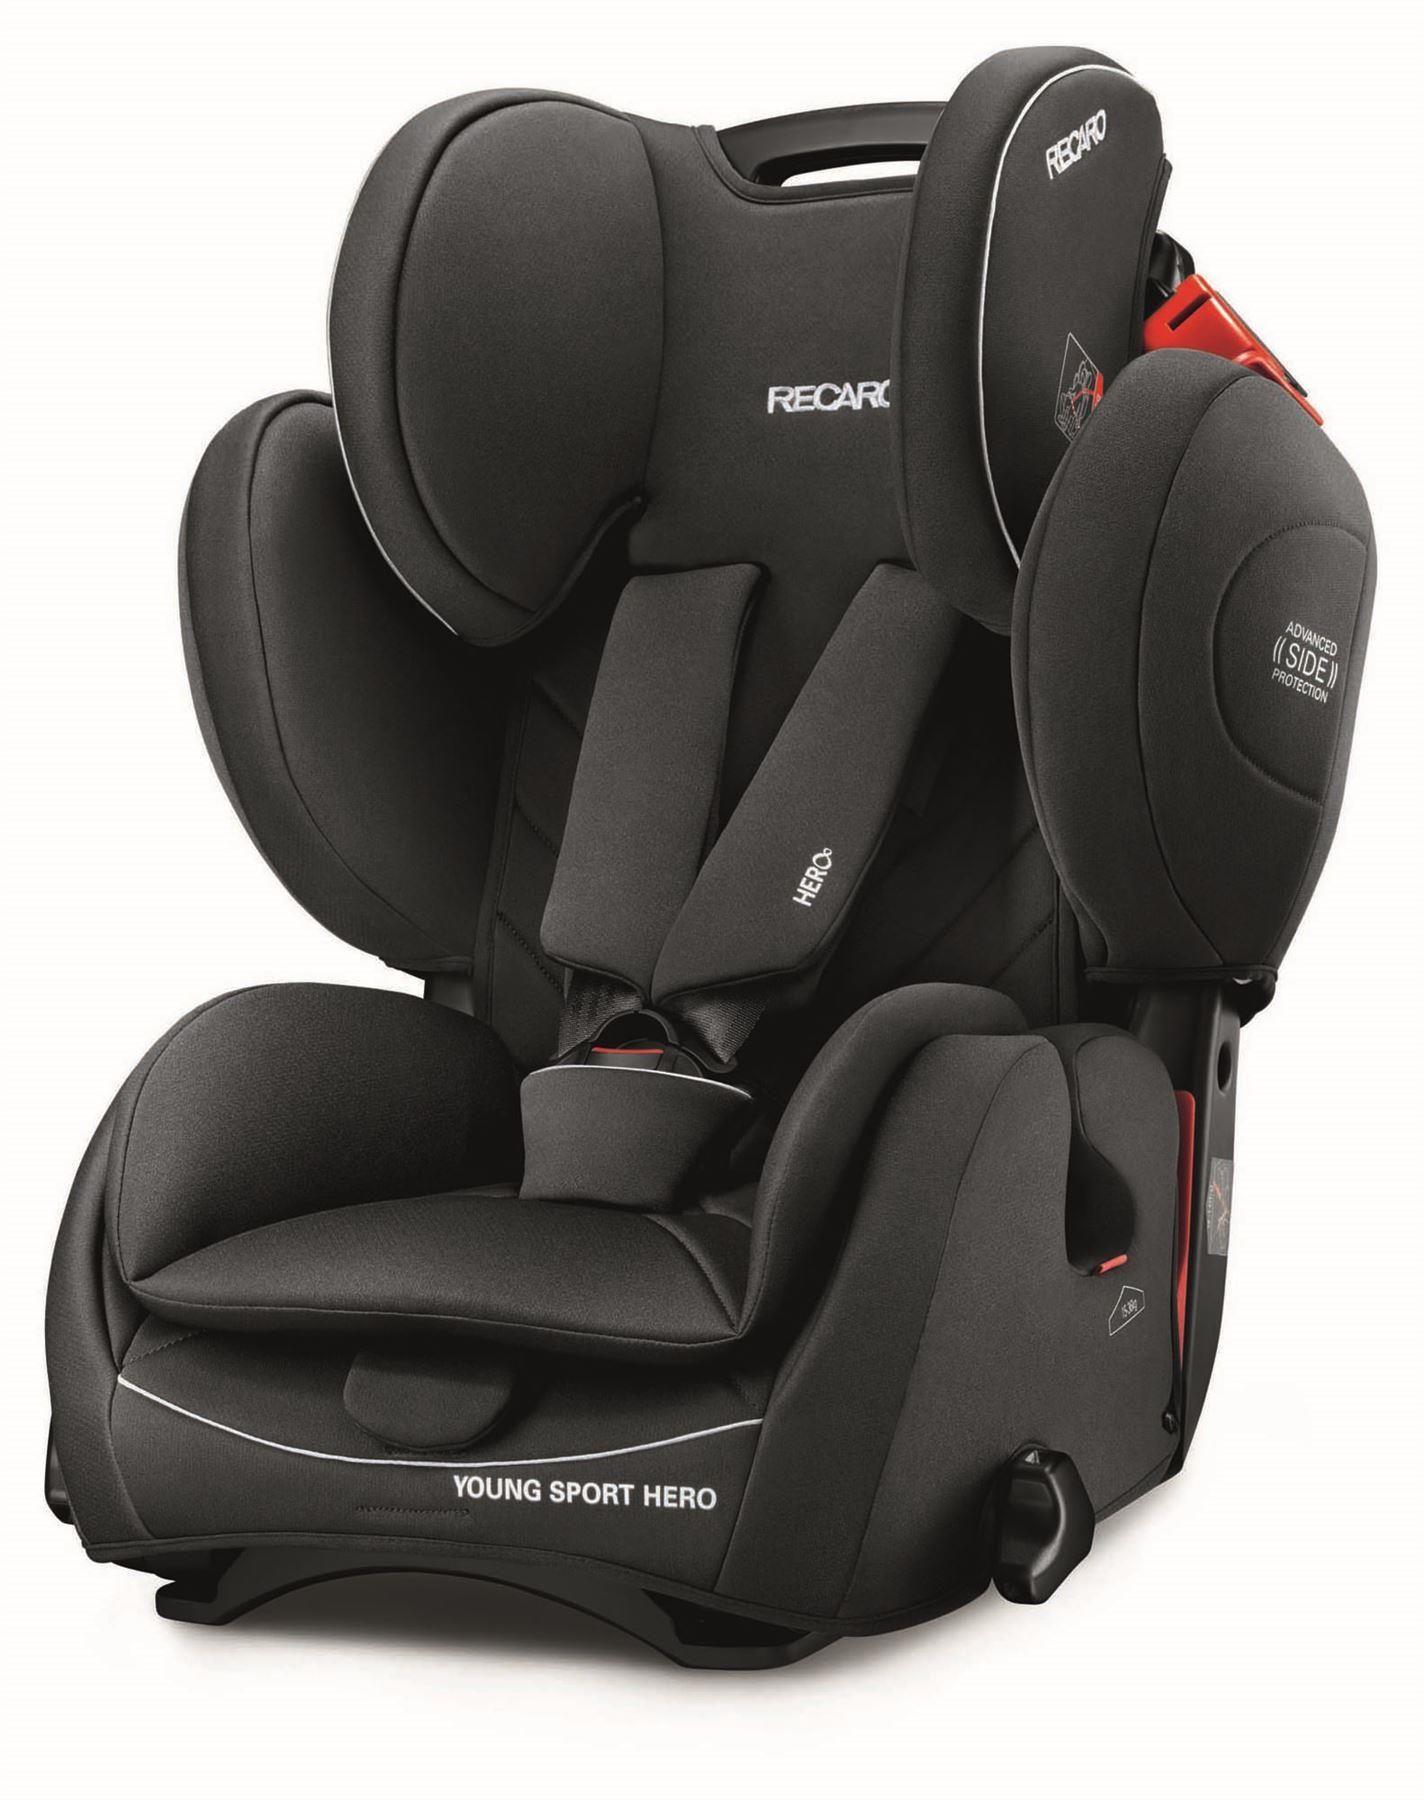 Recaro YoungSport Hero Group 1 2 3 Car Seat Performance